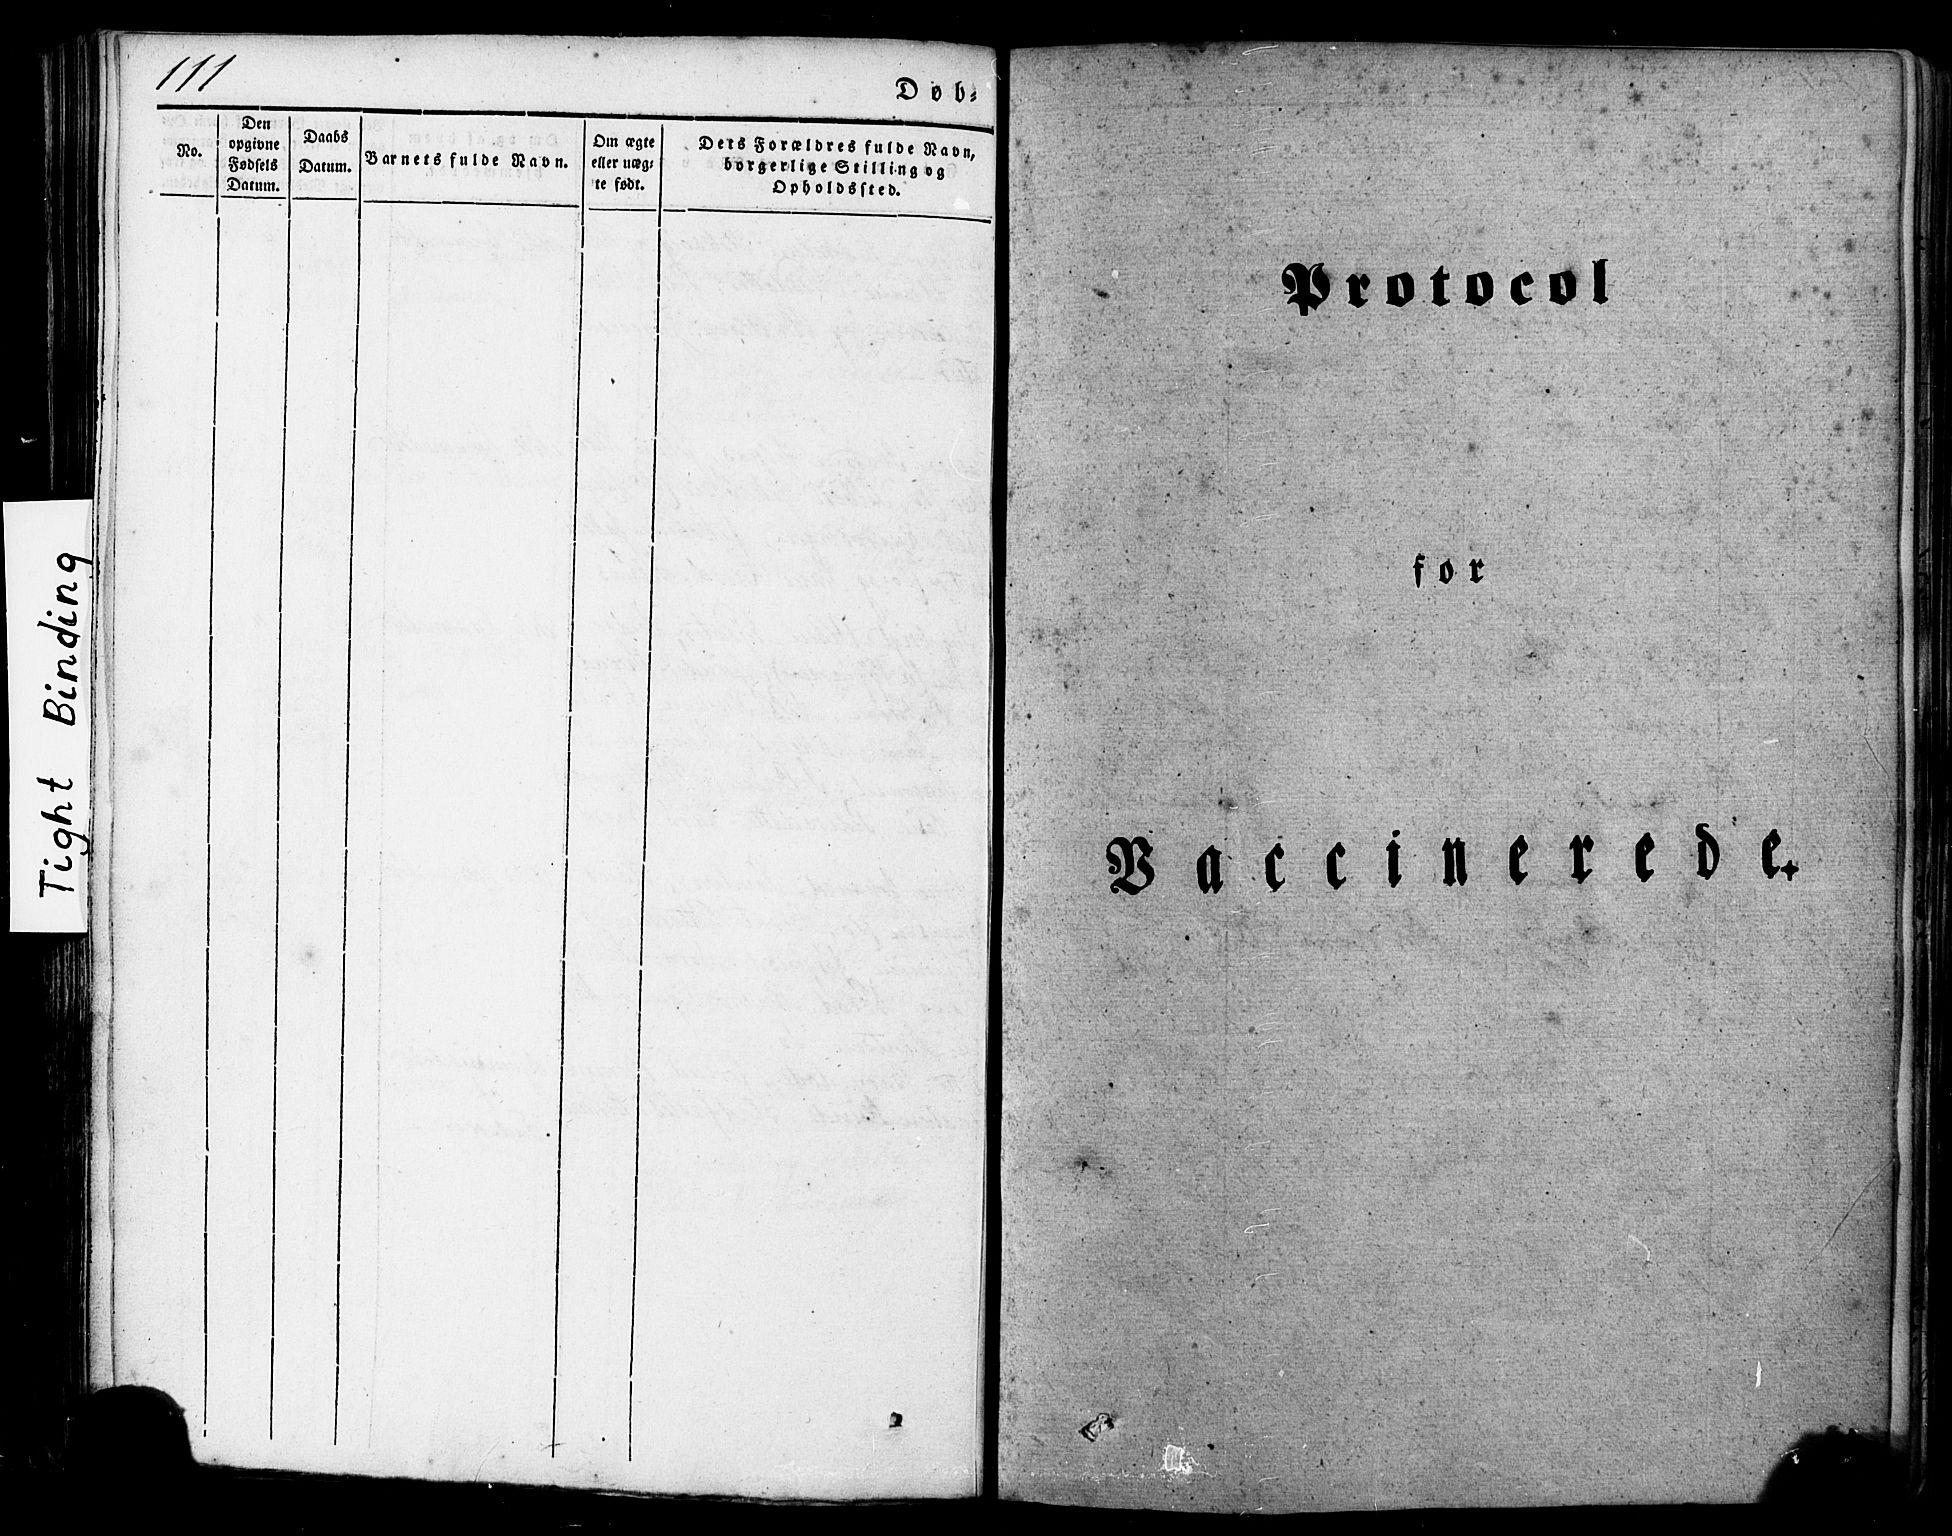 SAT, Ministerialprotokoller, klokkerbøker og fødselsregistre - Nordland, 839/L0567: Ministerialbok nr. 839A04, 1863-1879, s. 111